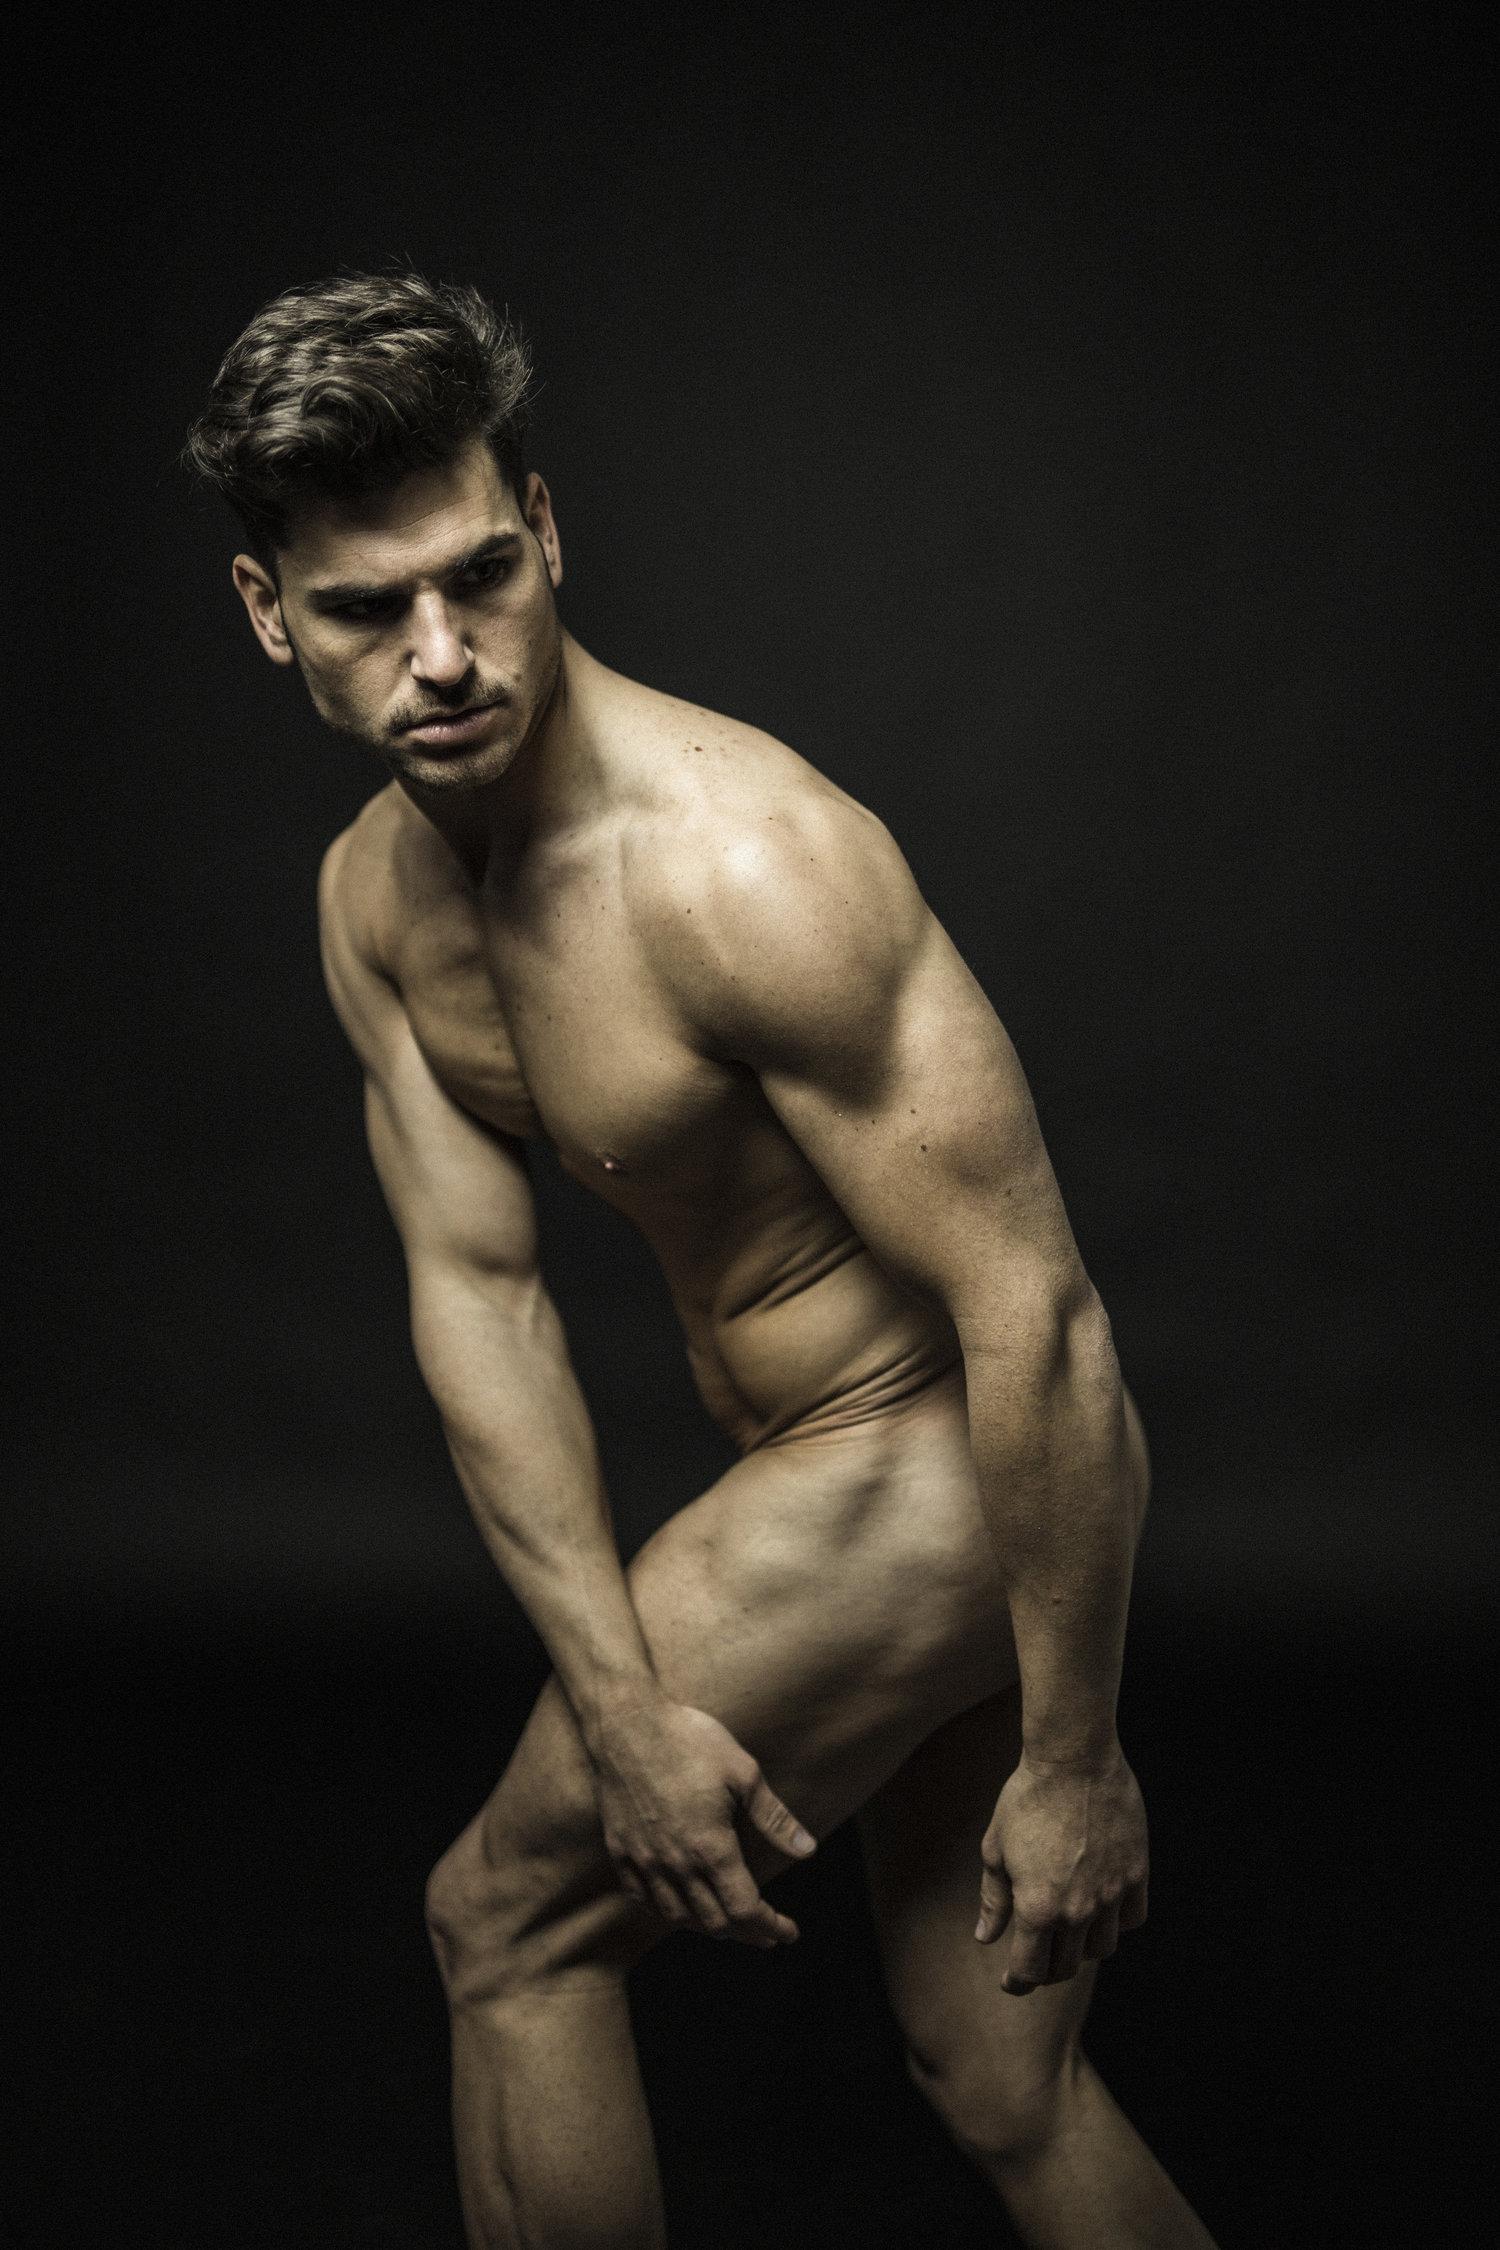 Adon Exclusive: Model Urtzi Sanchez By Oriol Canpra